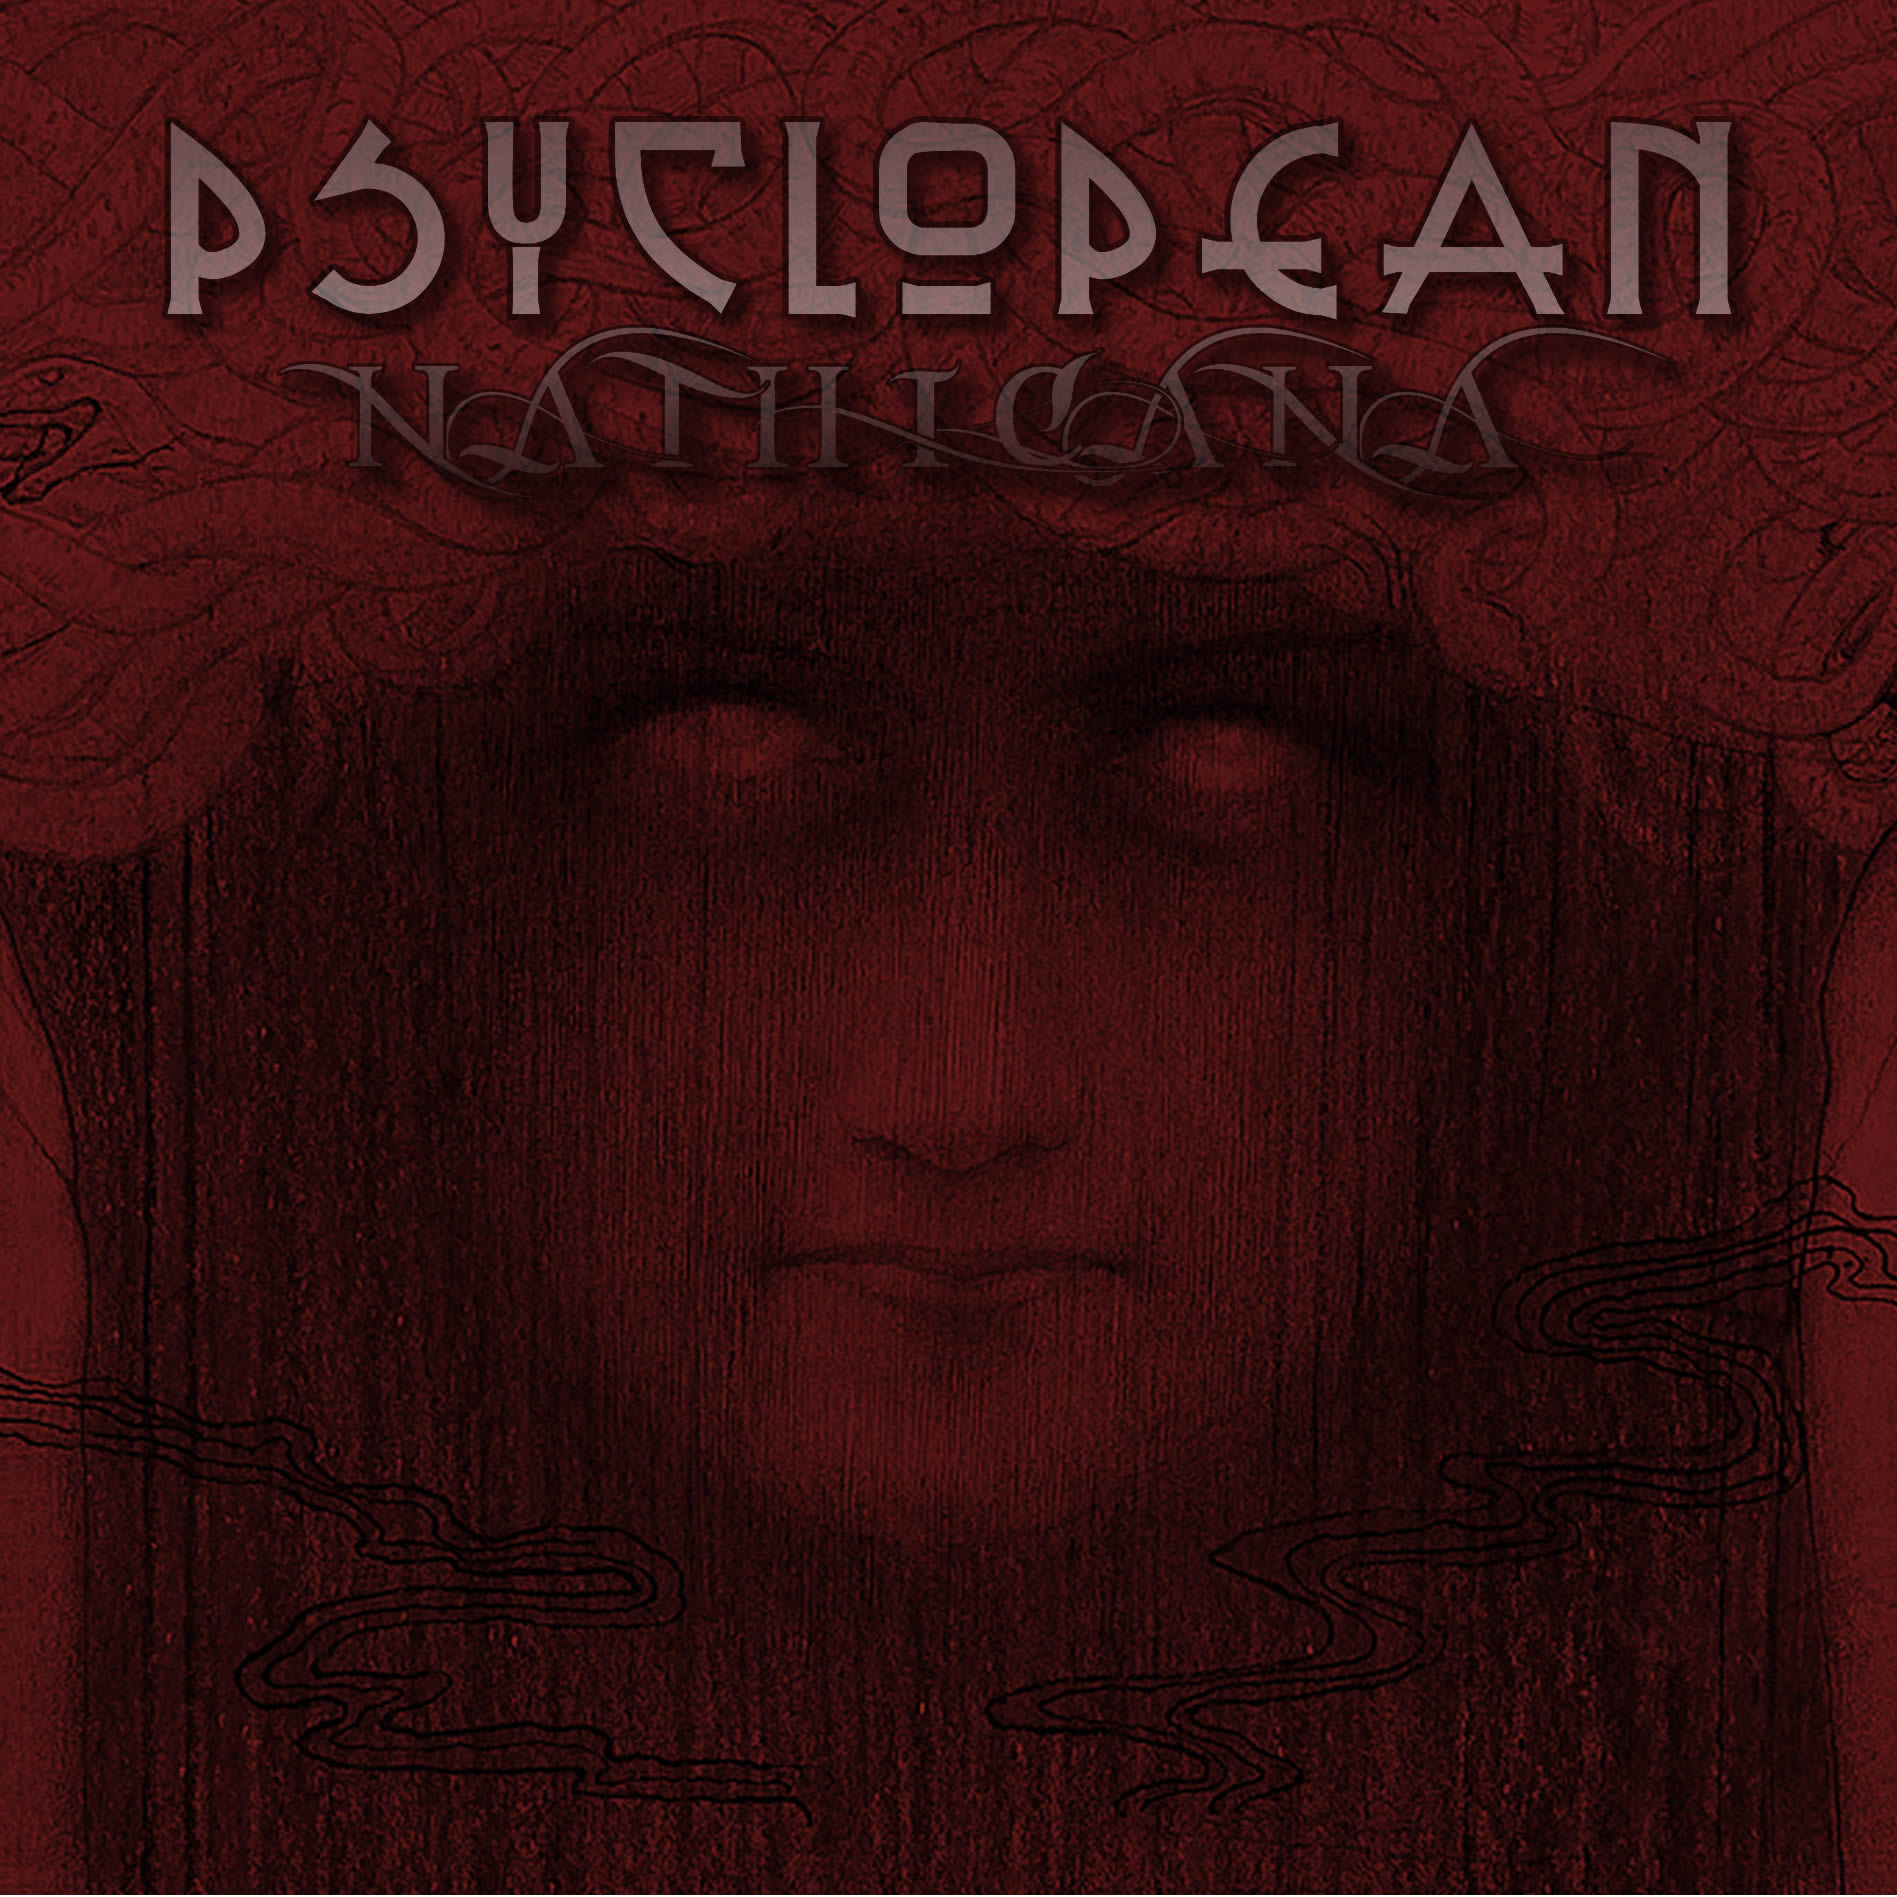 Nathicana